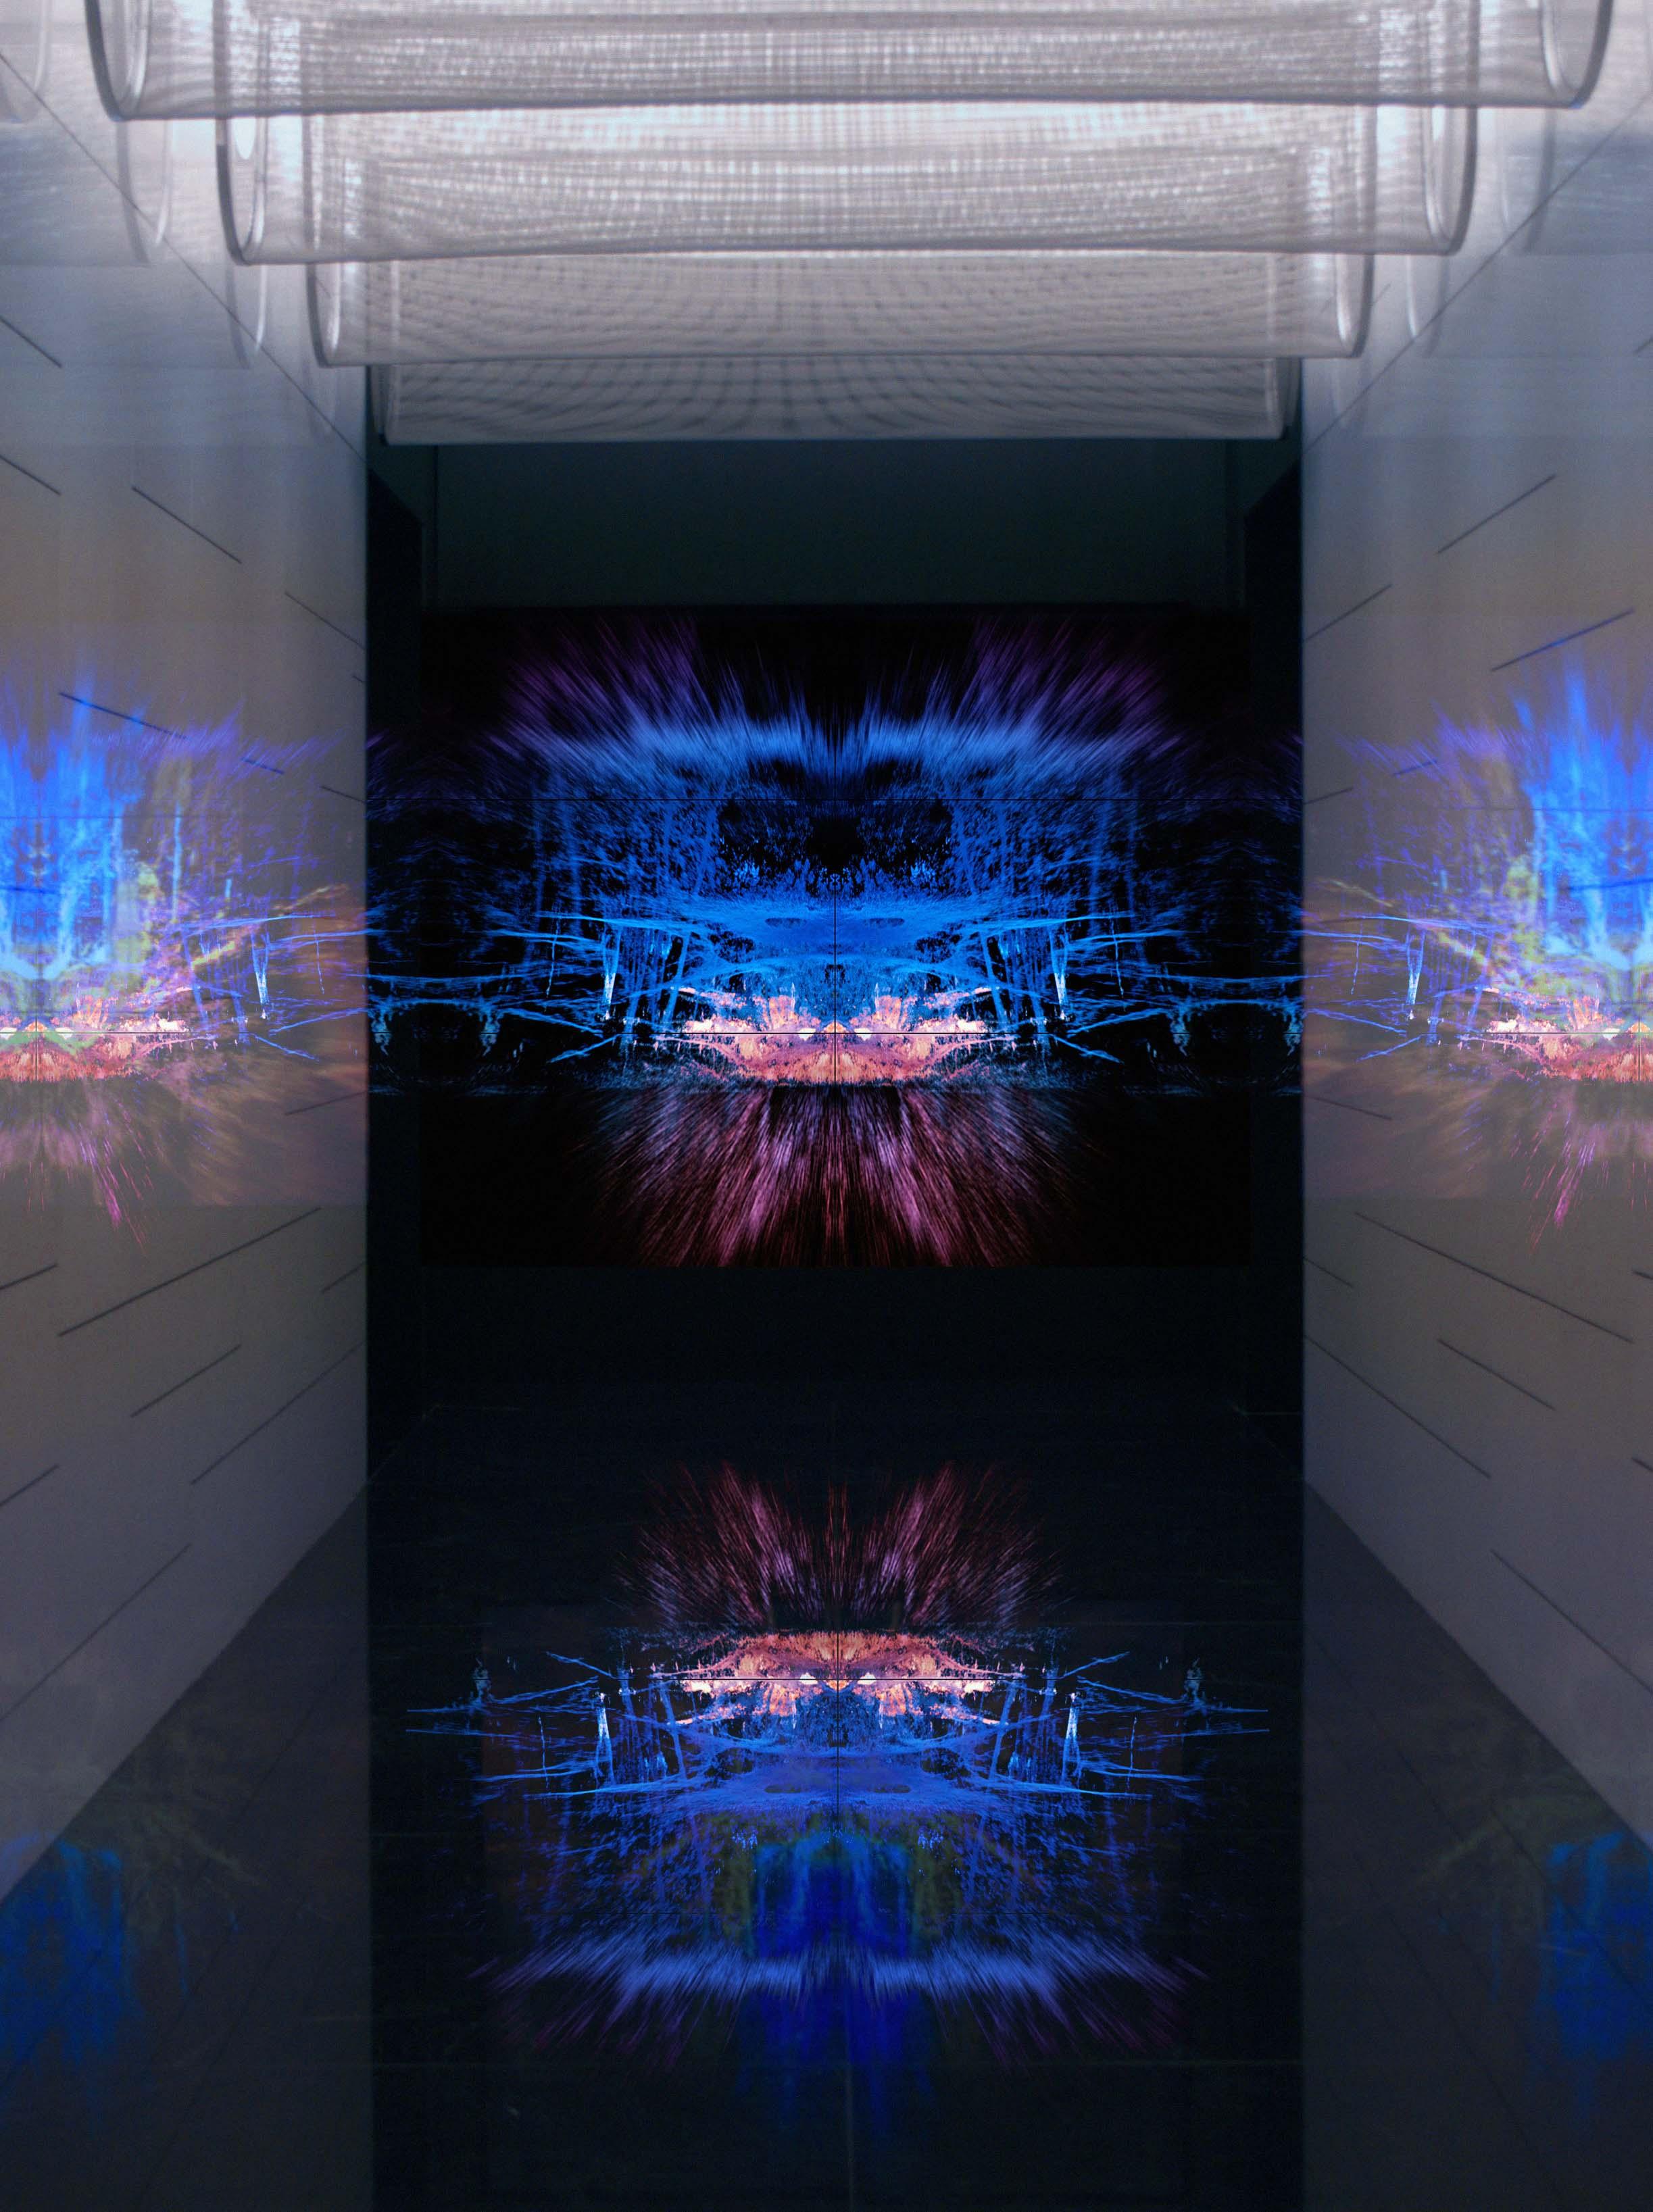 marco-brambilla-echo-work-01.jpg